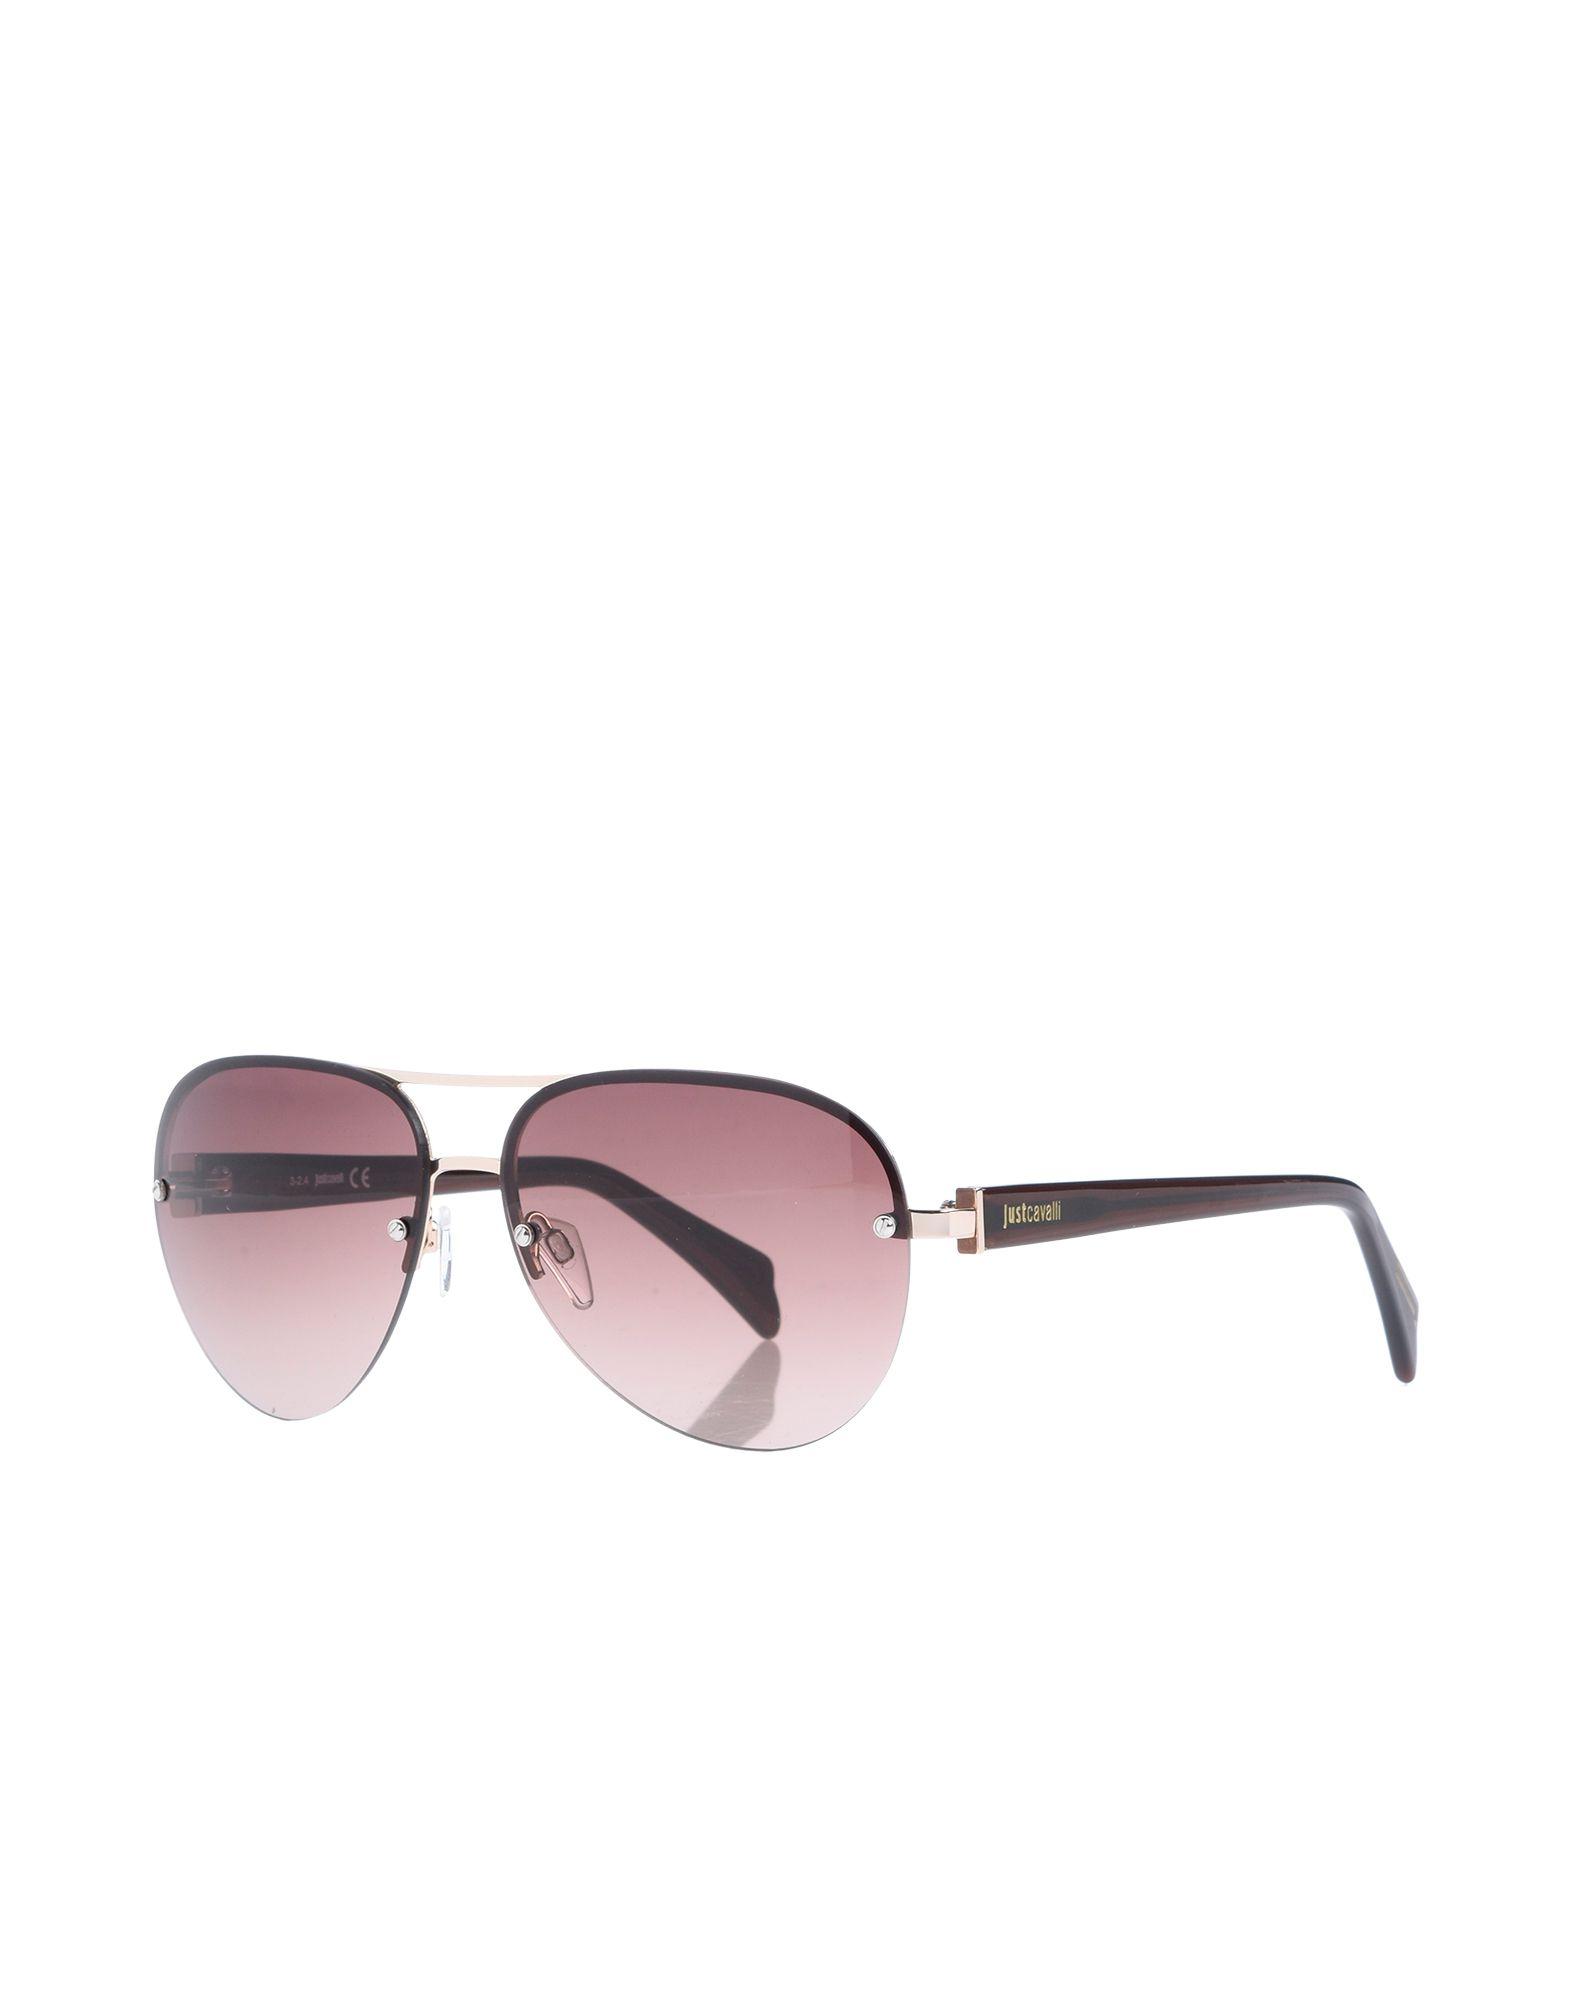 JUST CAVALLI Солнечные очки leo солнечные очки